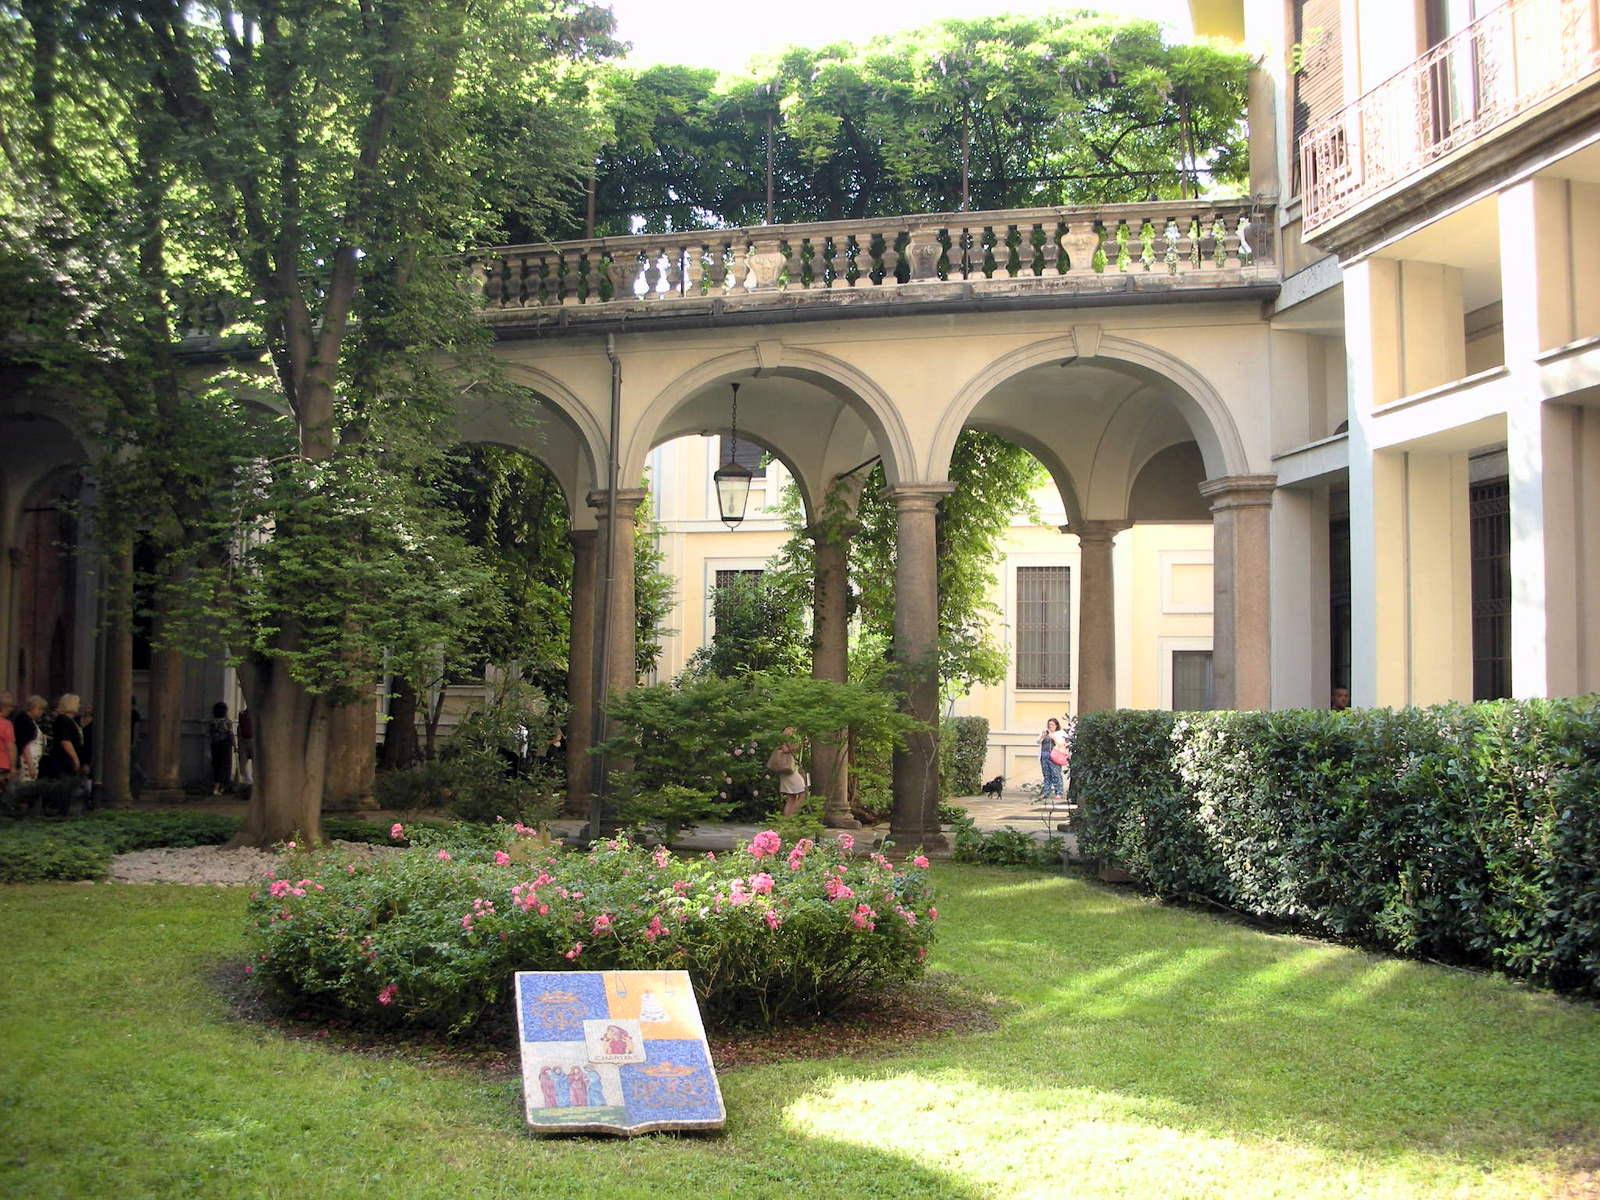 palazzo-archinto-open-house-milano